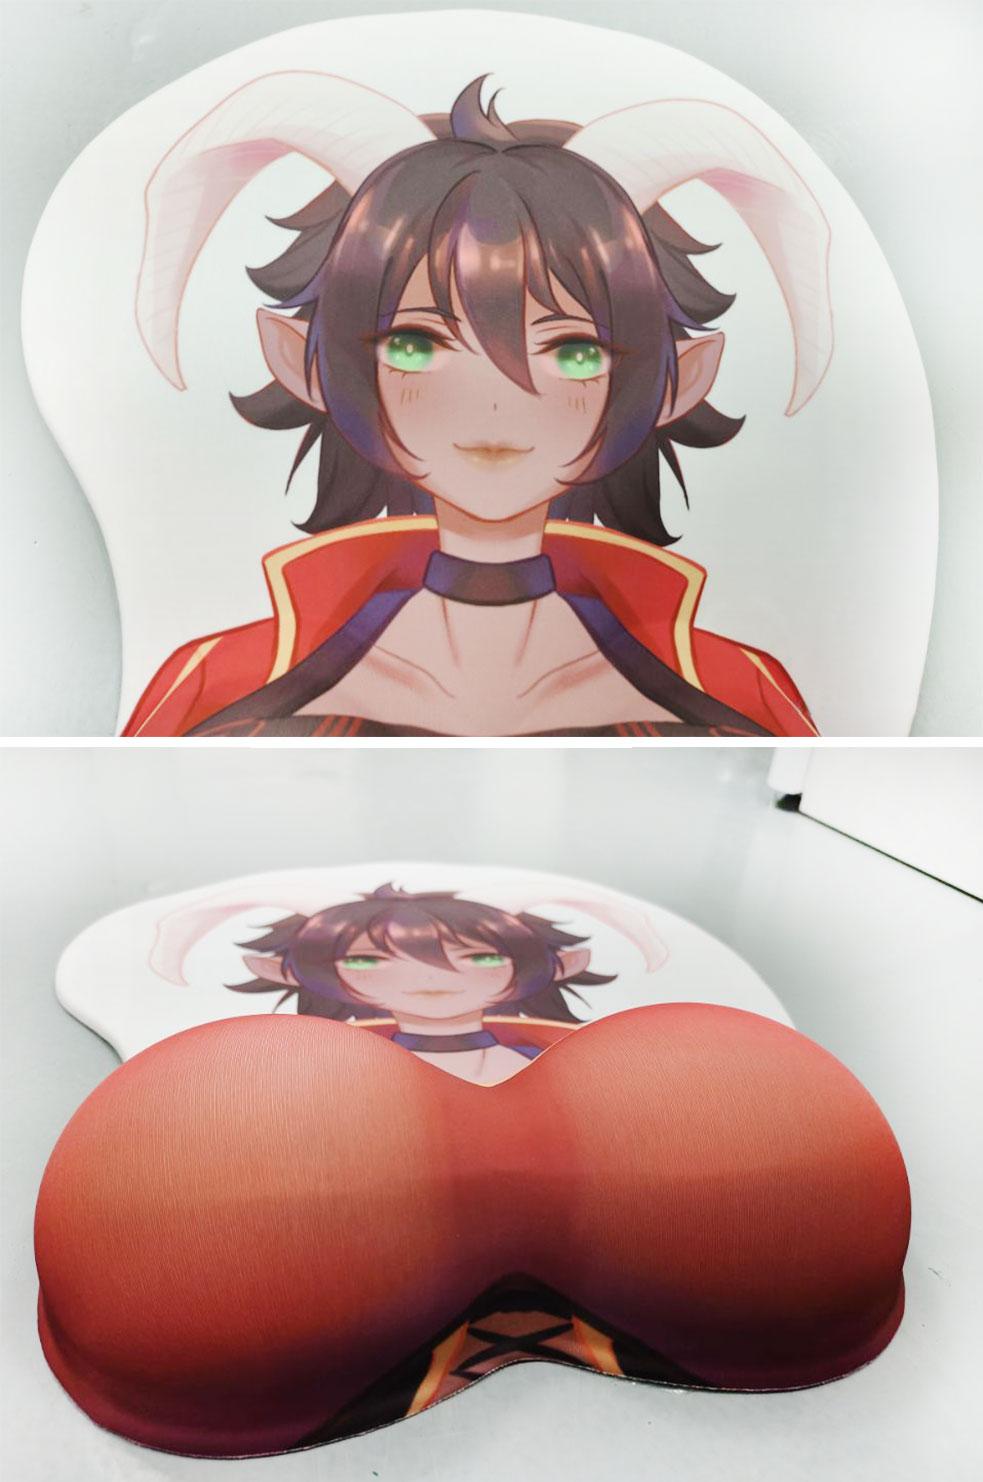 heles life size oppai mousepad 8669 - Anime Mousepads